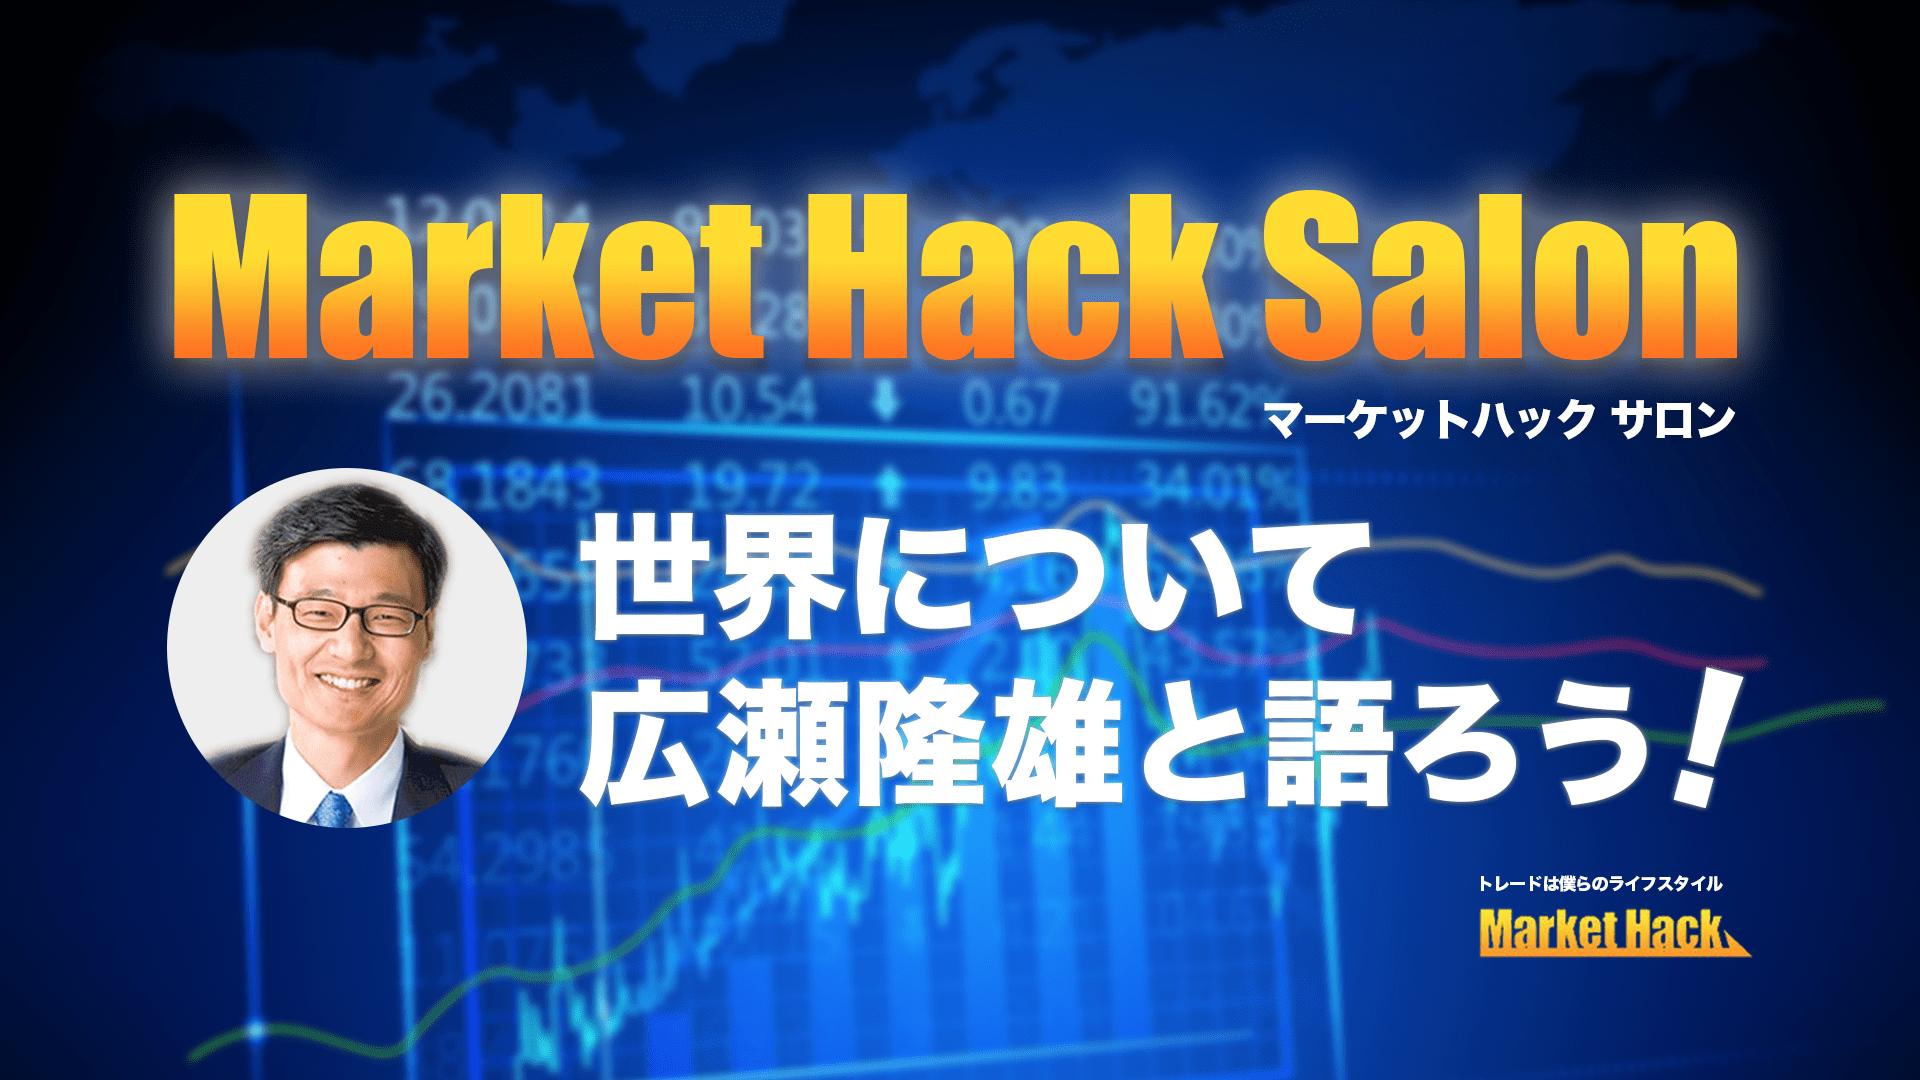 Market Hack Salon 〜世界について広瀬隆雄と語ろう!〜